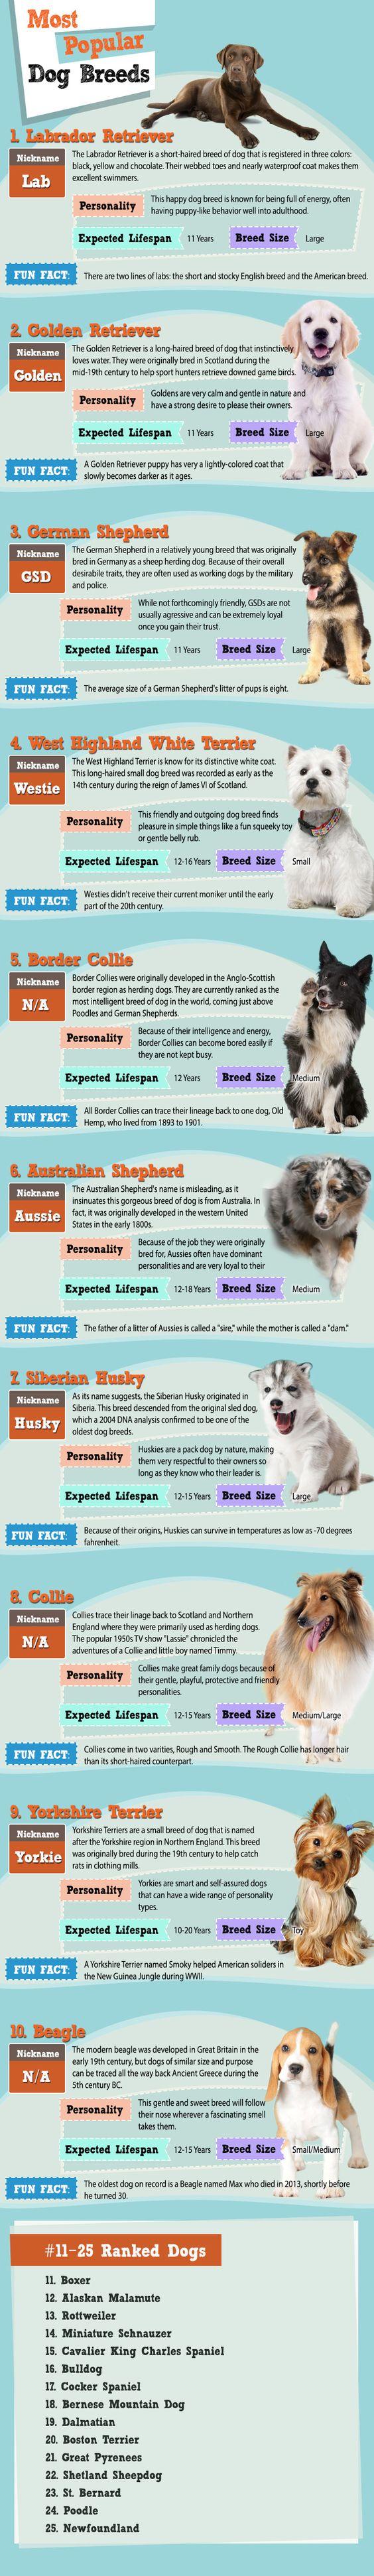 popular dog breeds infographic